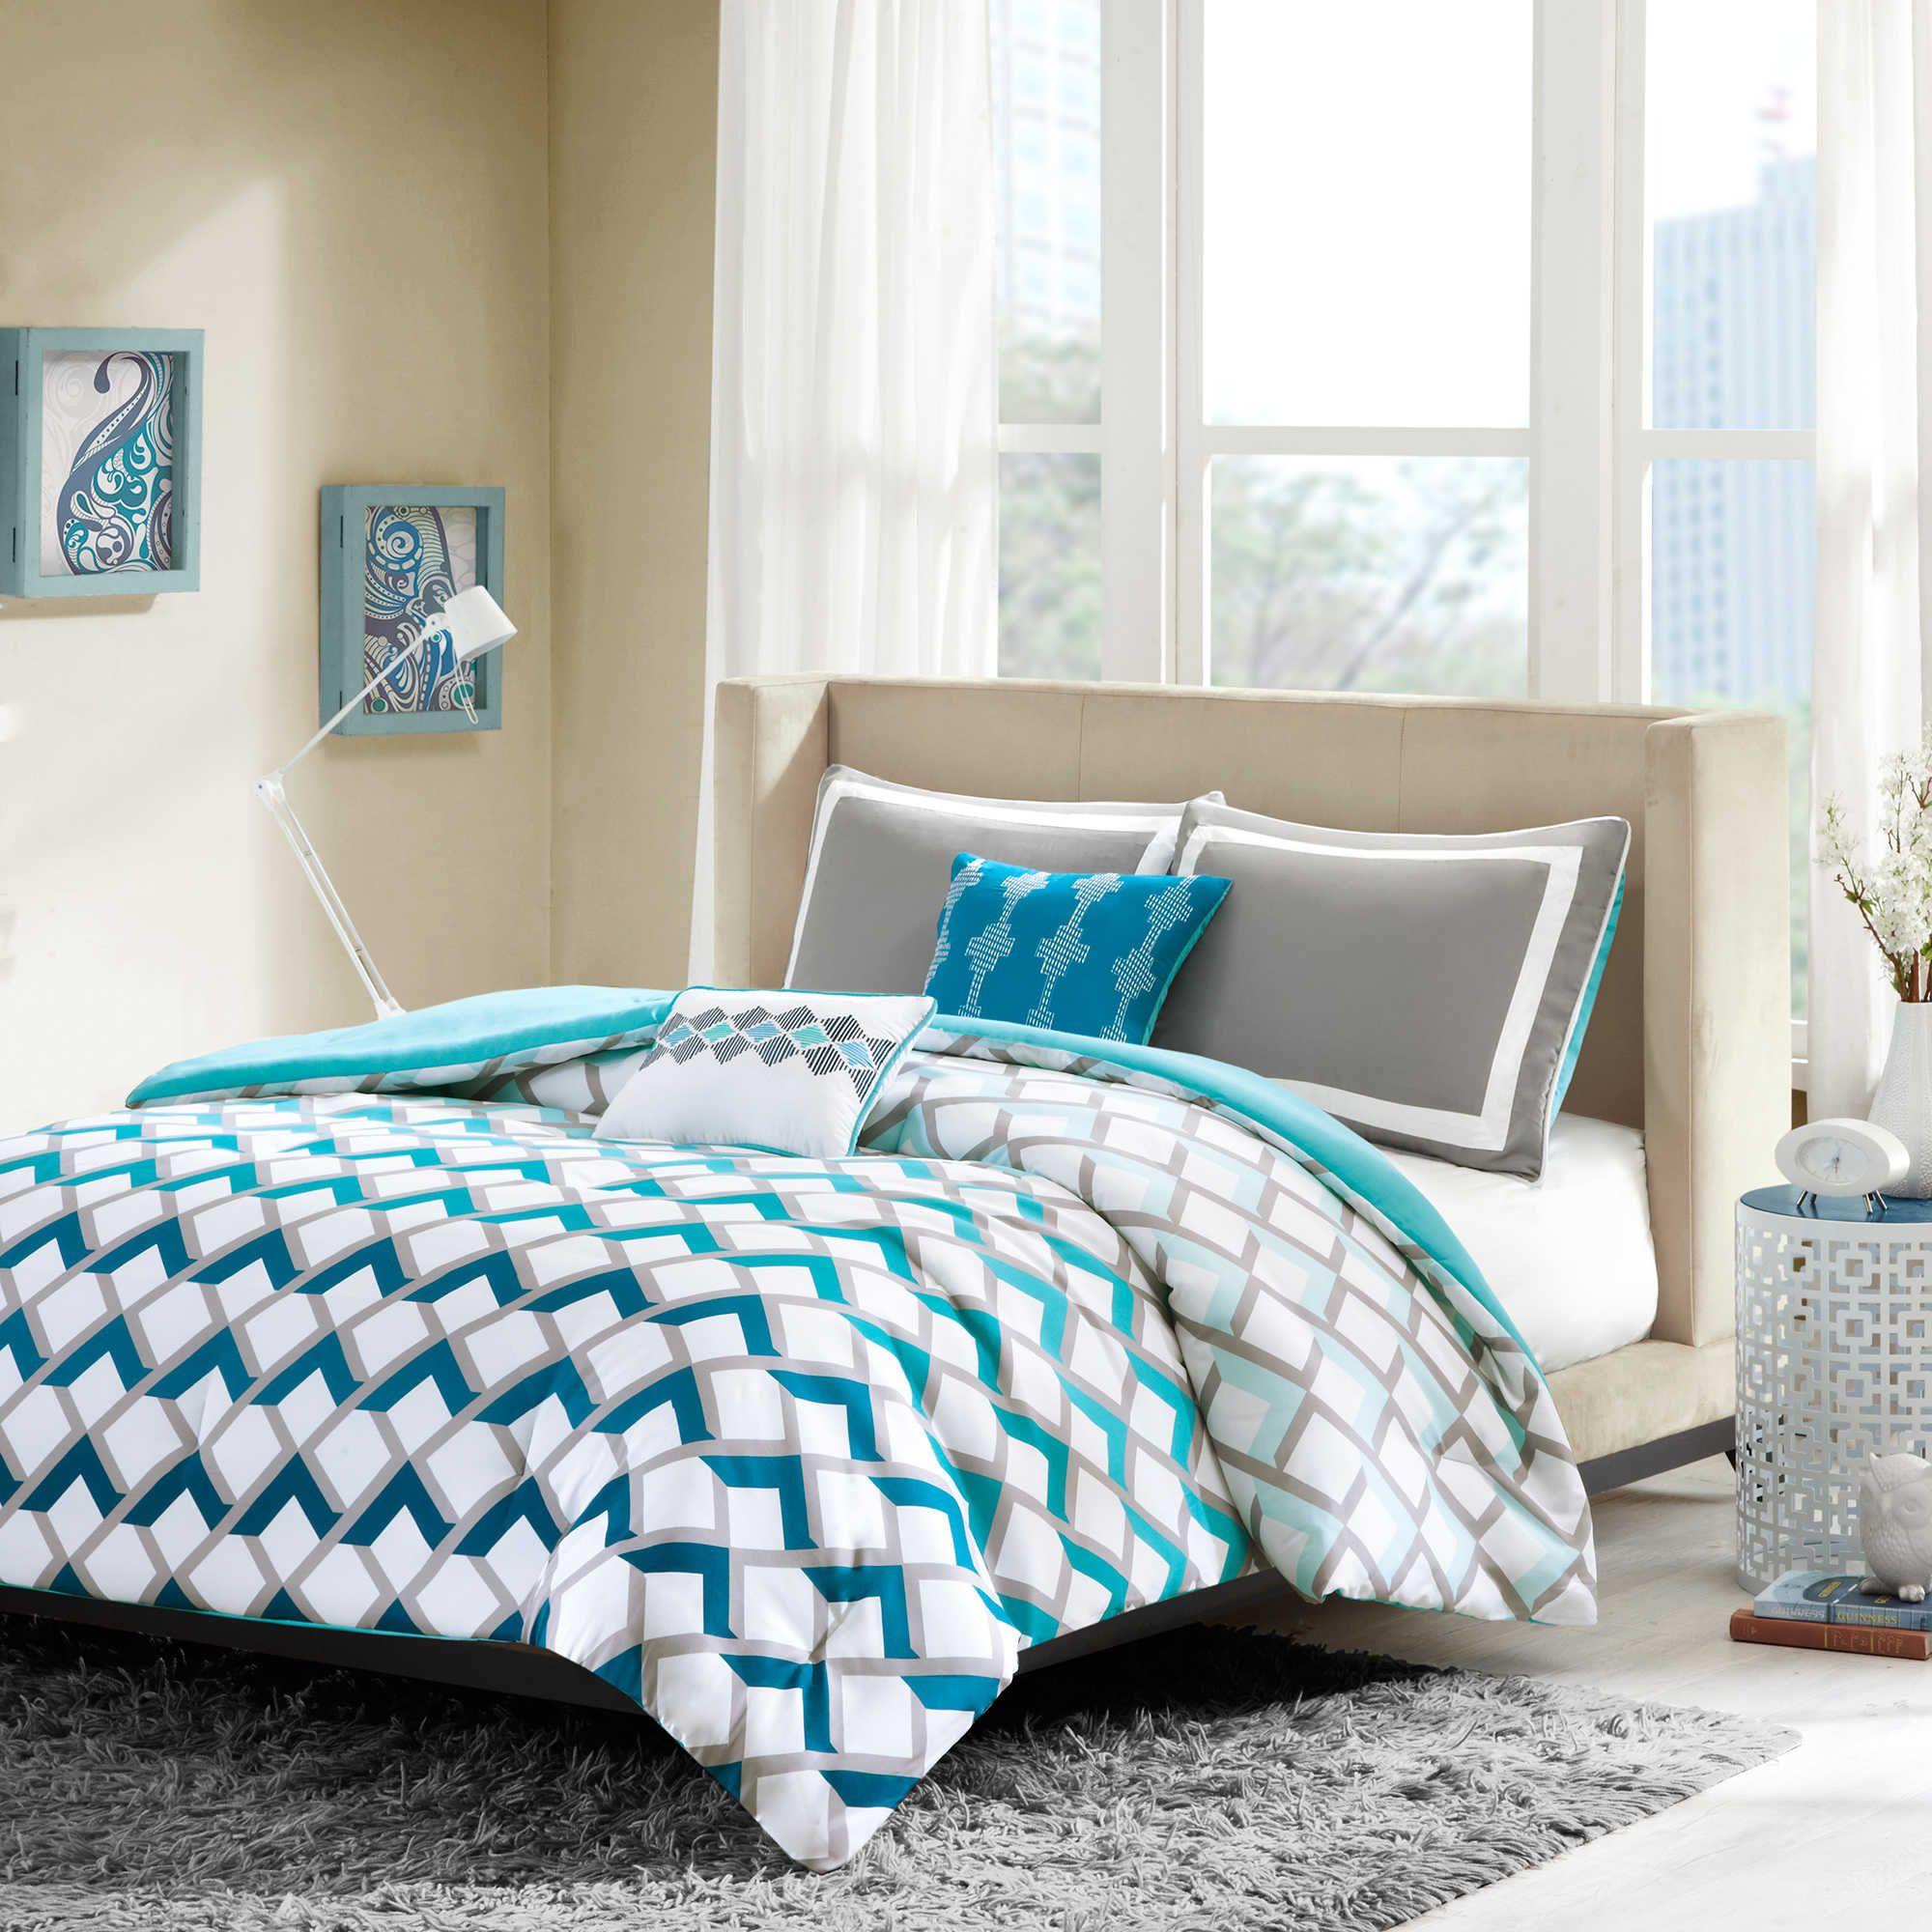 Intelligent Design Finn Full/queen Comforter Set In Blue